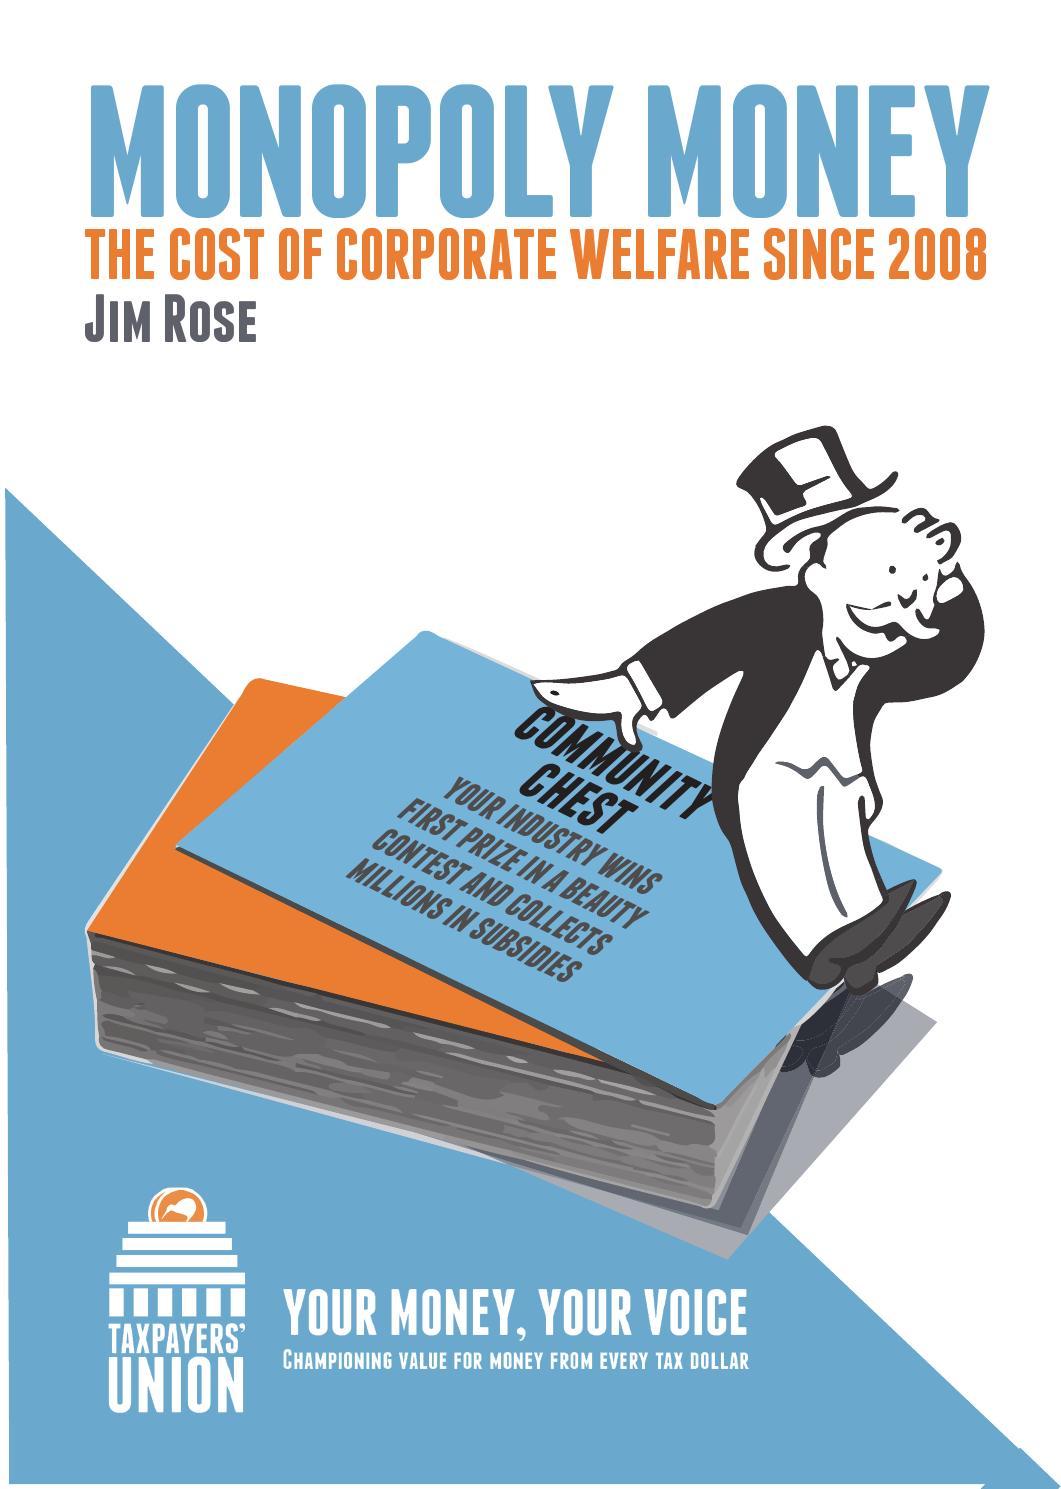 Monopoly Money - Taxpayers' Union